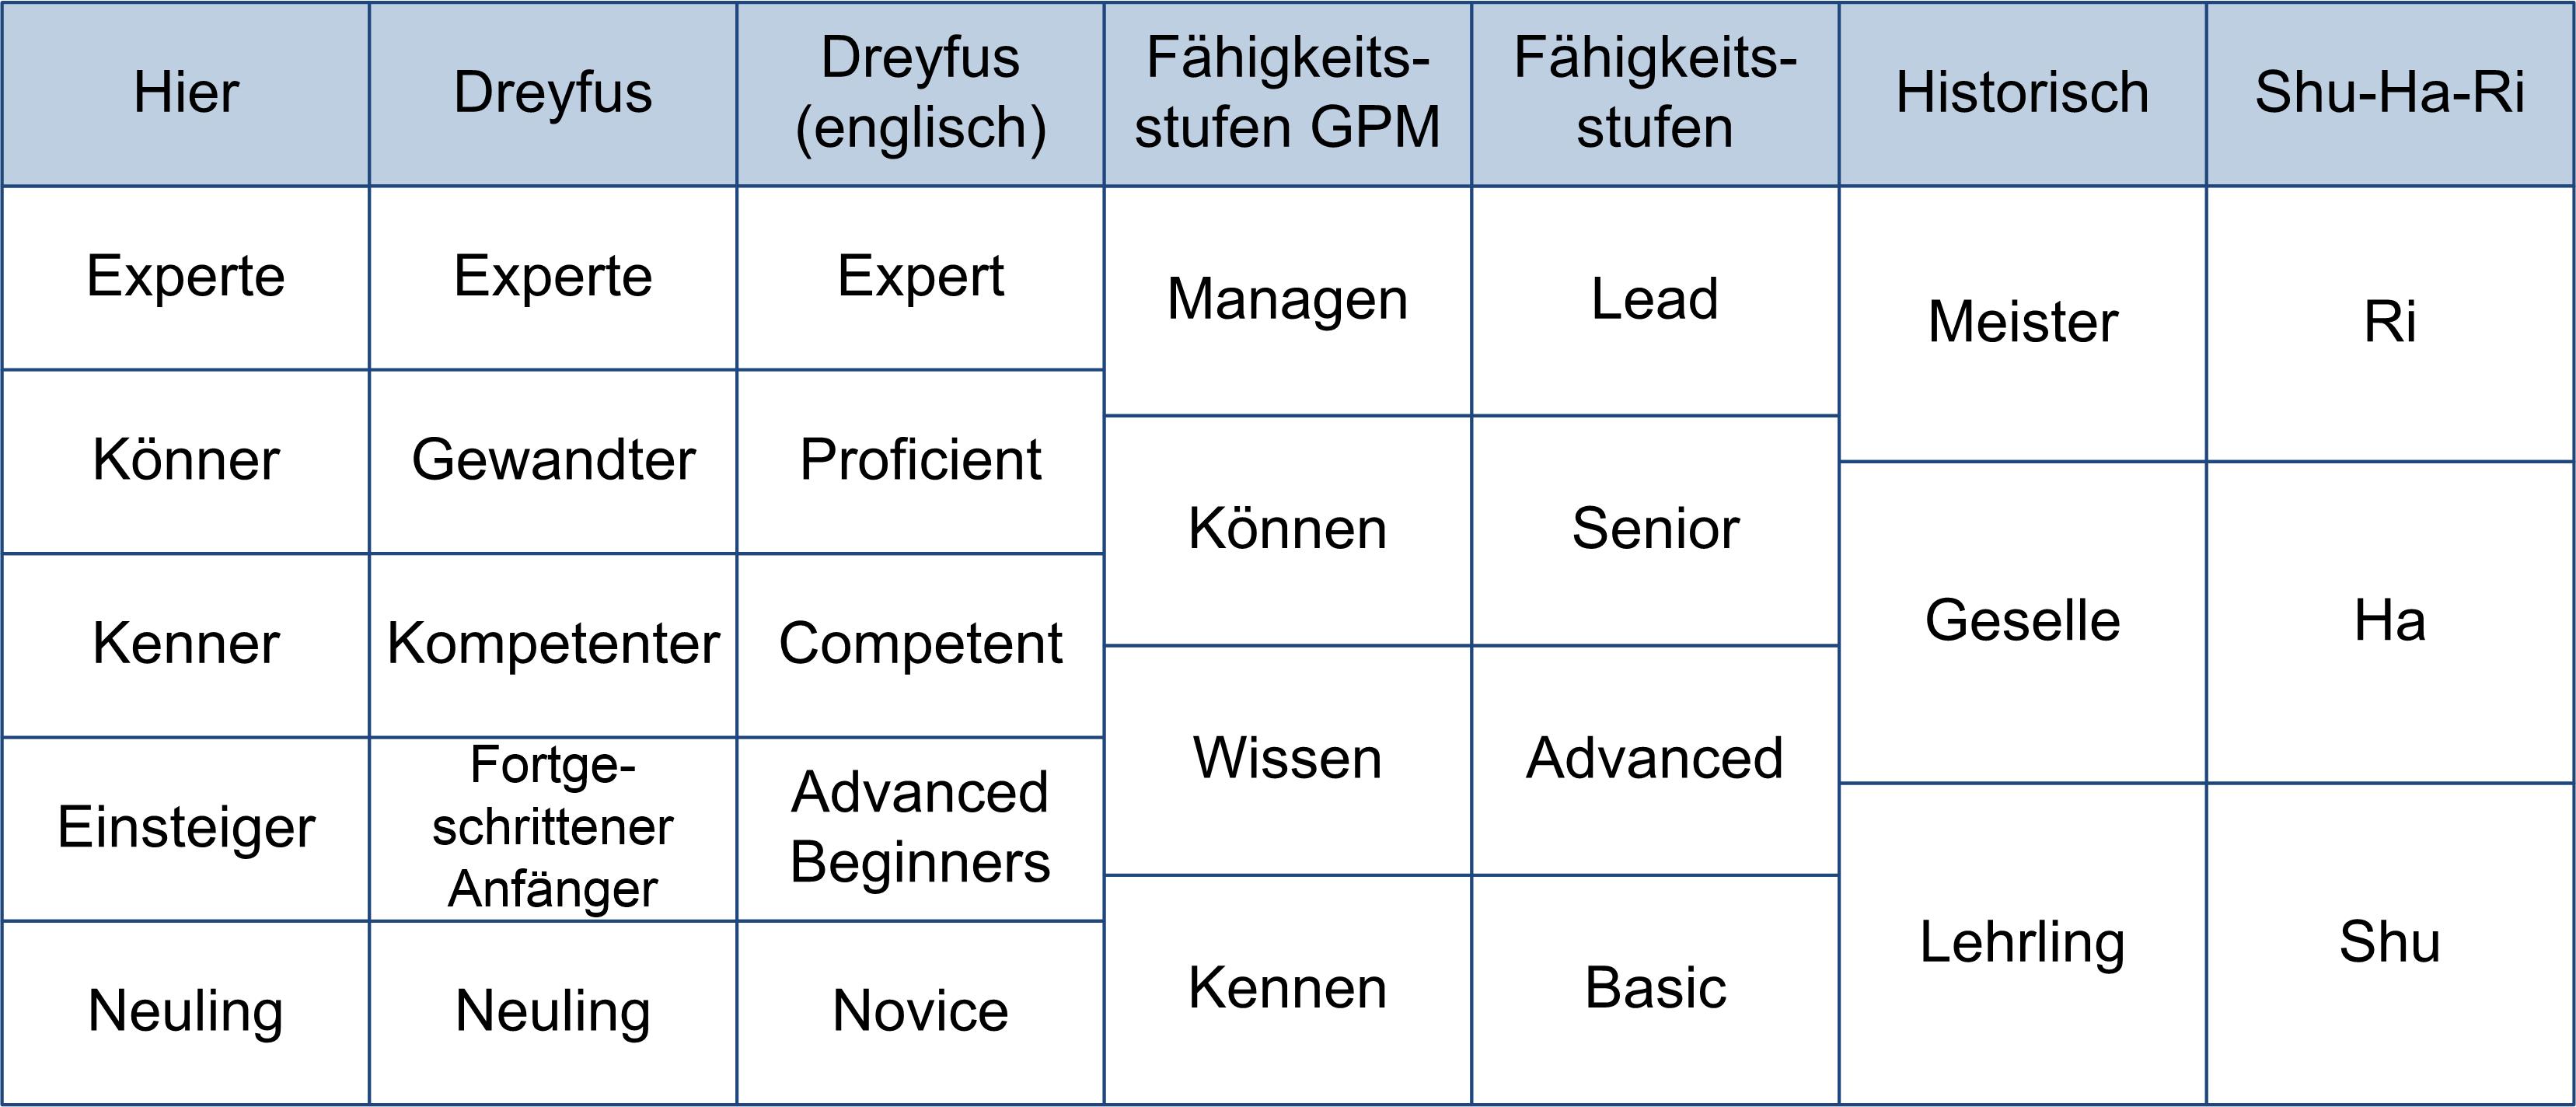 peco-all-kenntnis-klassifikation-vergleich